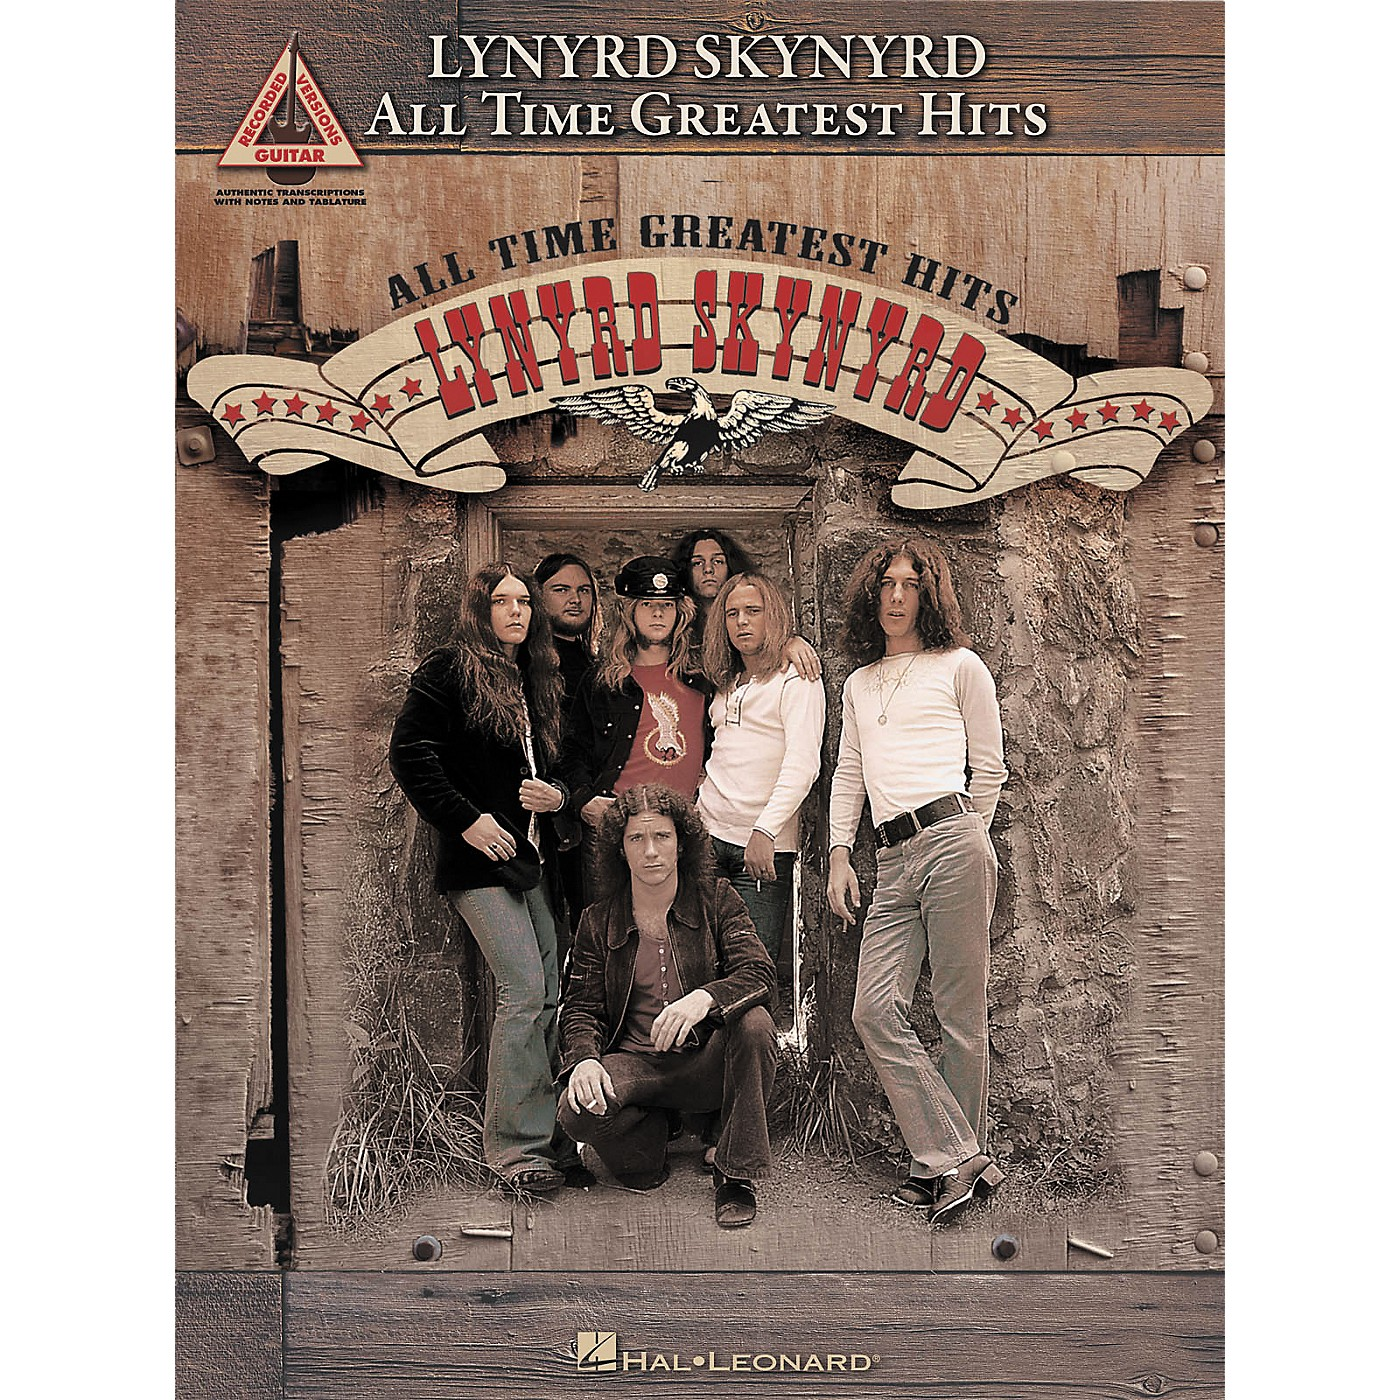 Hal Leonard Lynyrd Skynyrd - All Time Greatest Hits Guitar Tab Songbook thumbnail